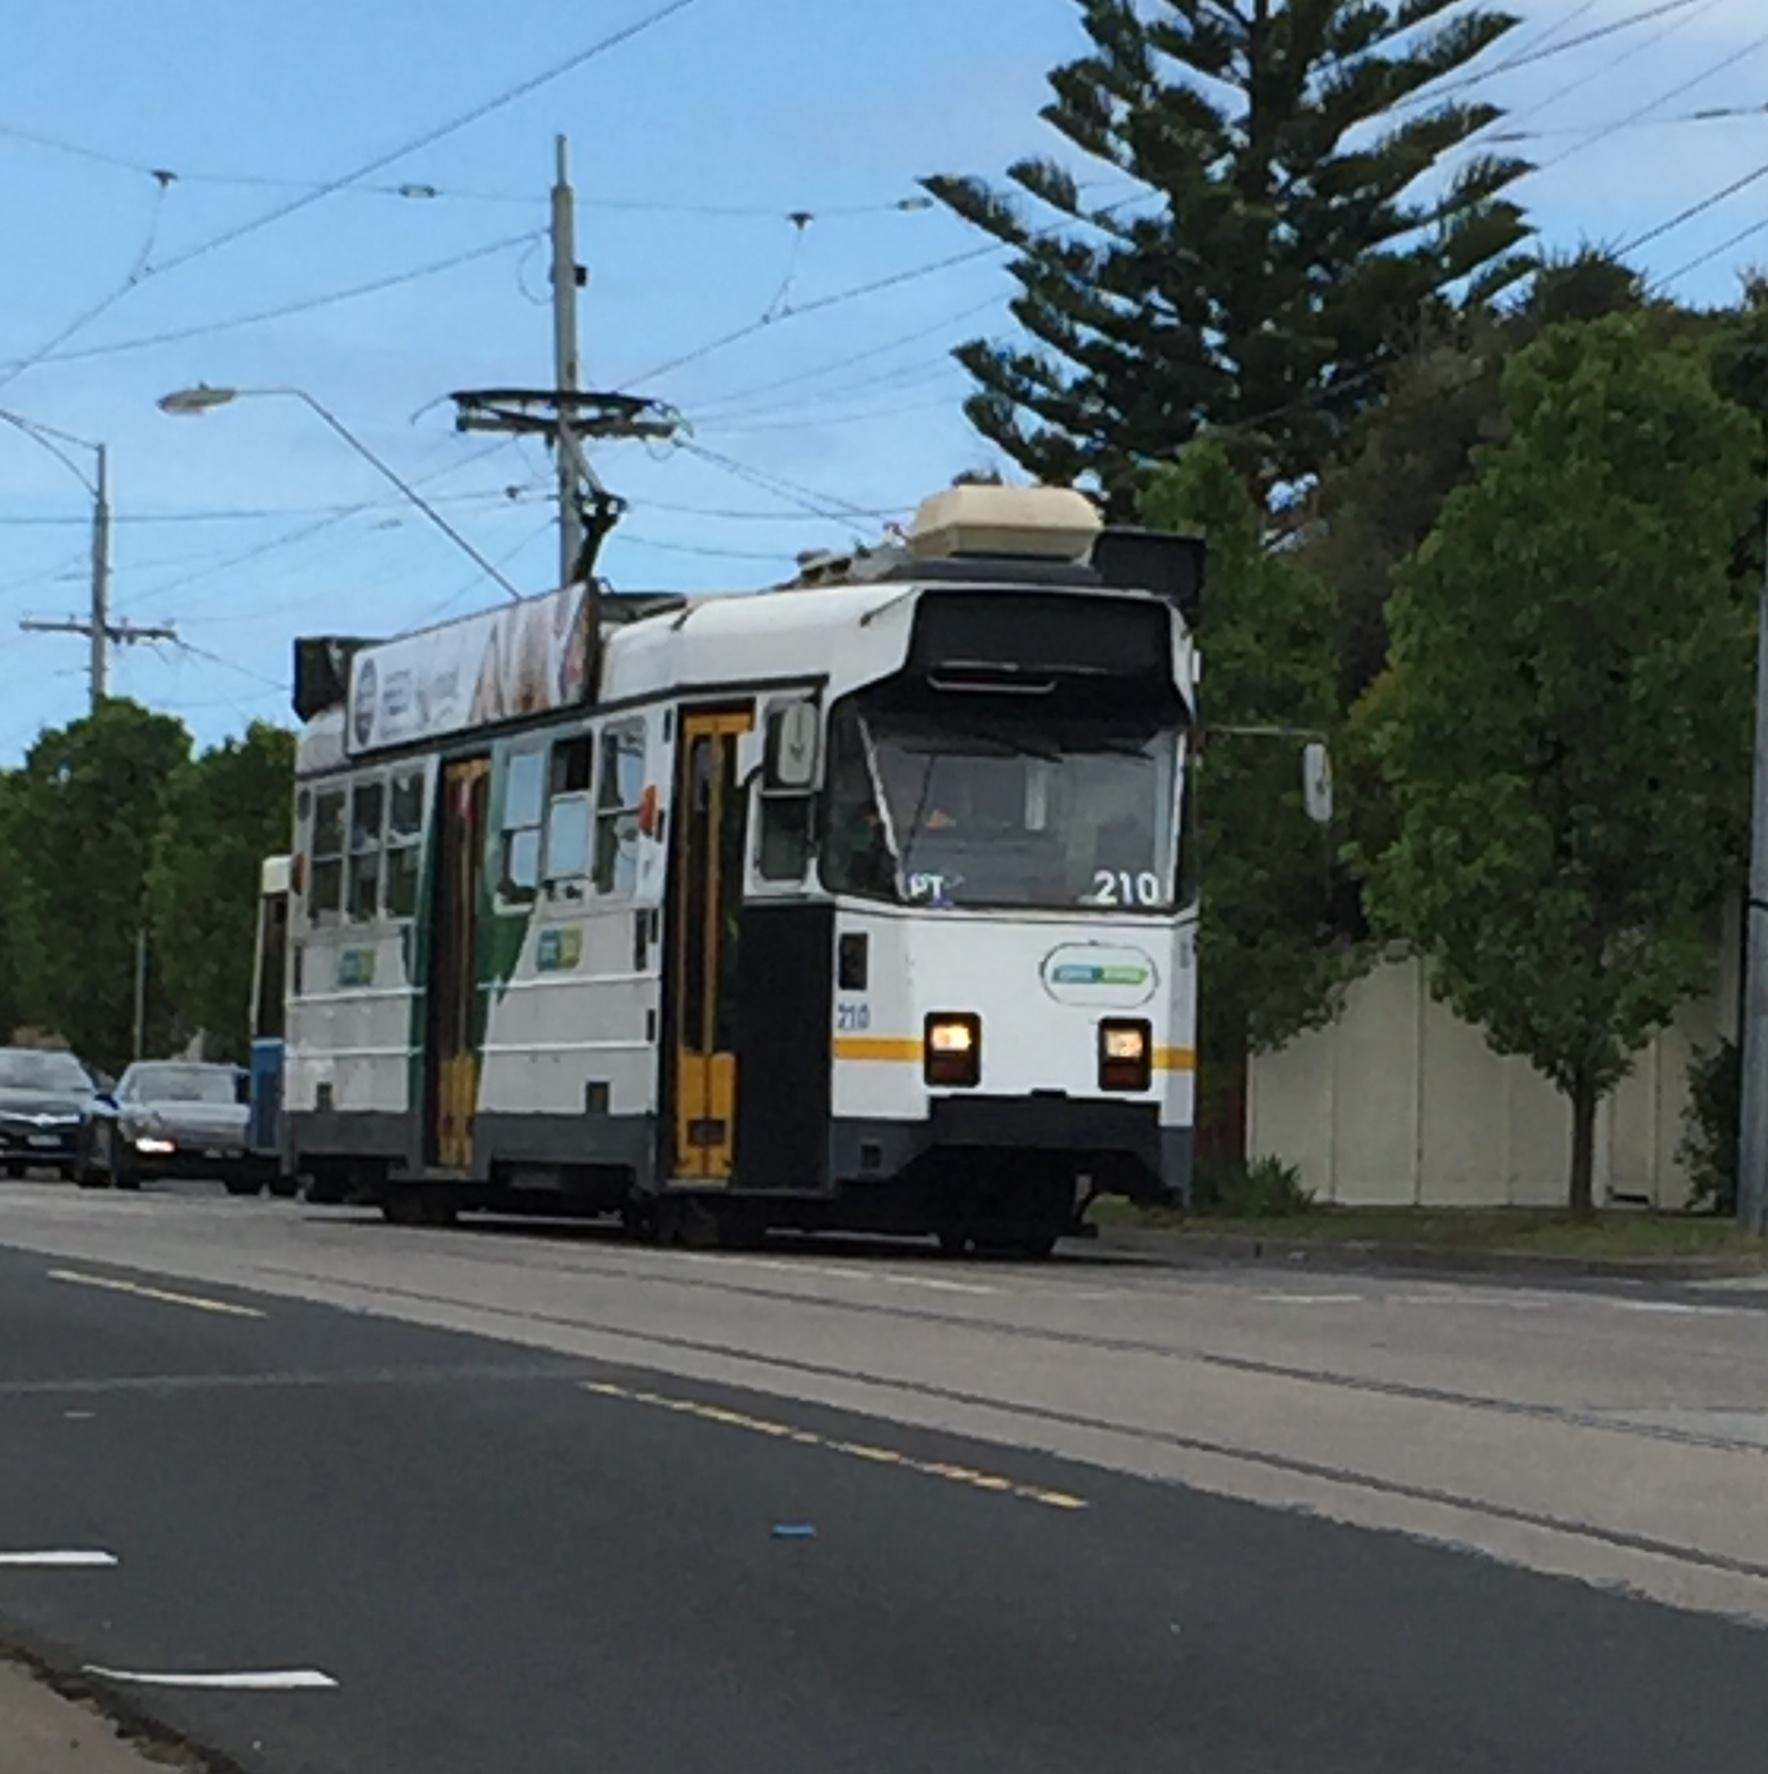 Melbourne Trams. Super convenient but also super crowded at peak commute times.